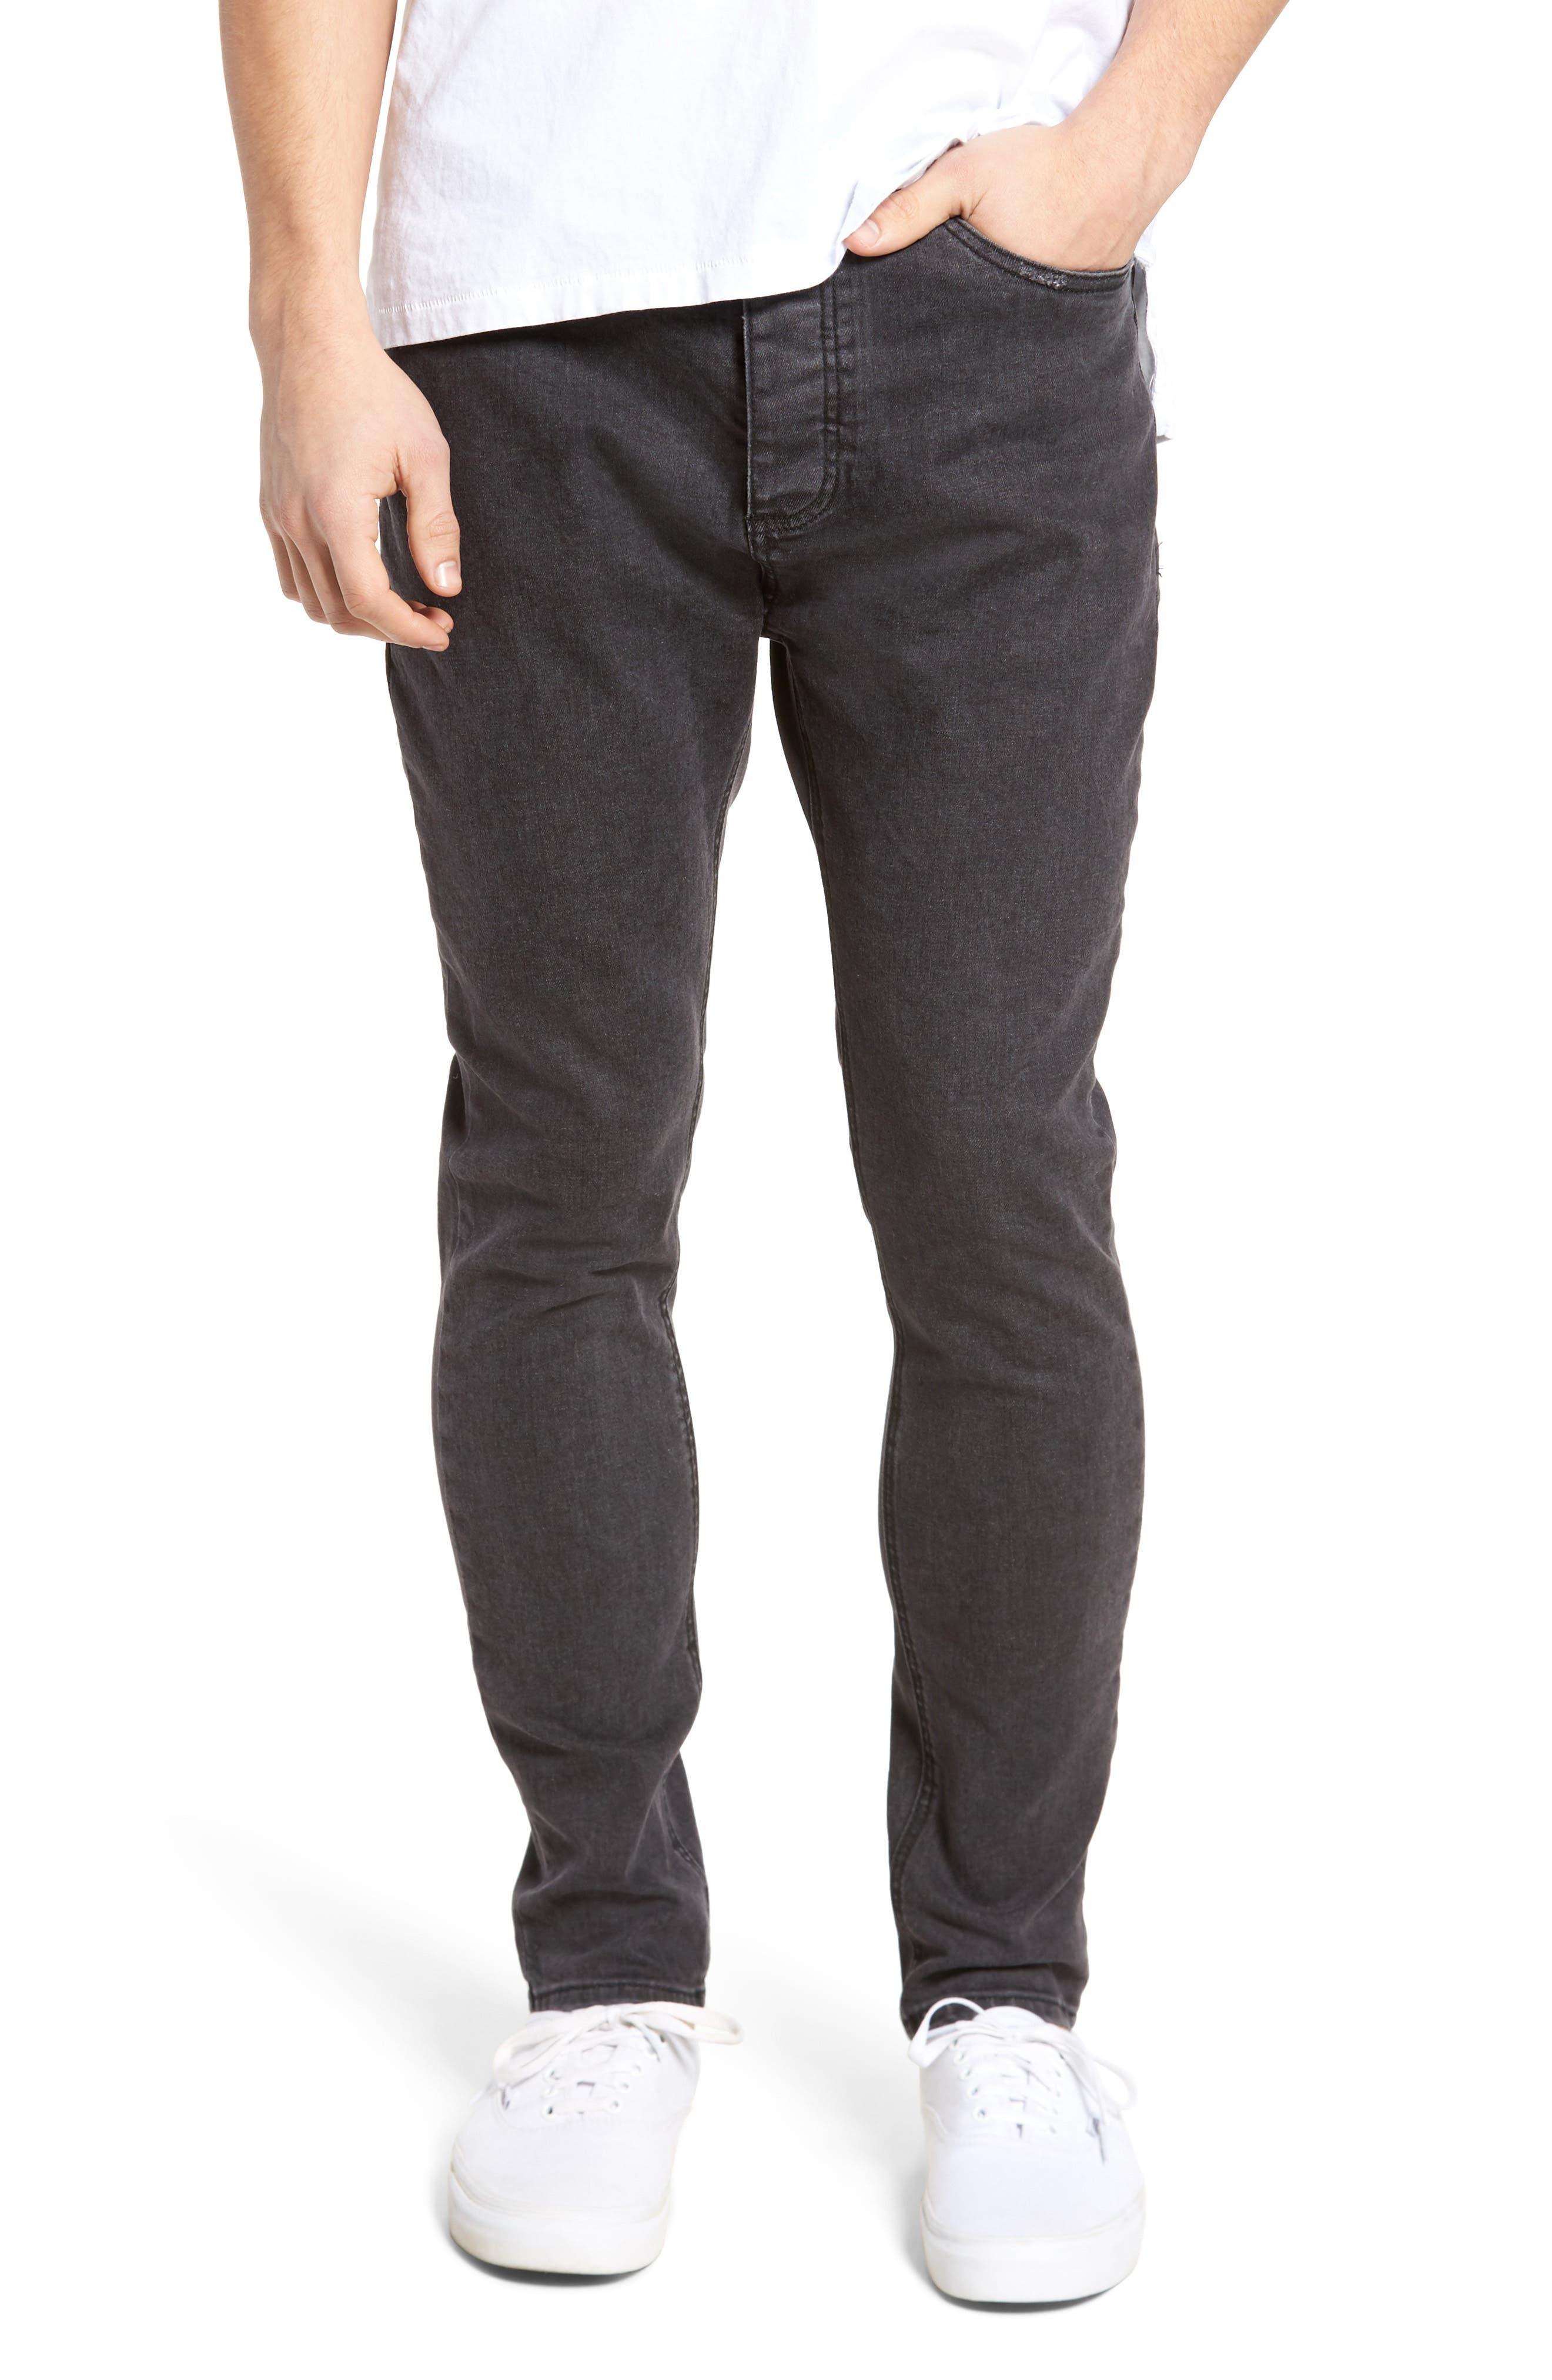 Joe Blow Destroyed Denim Jeans,                         Main,                         color, Black